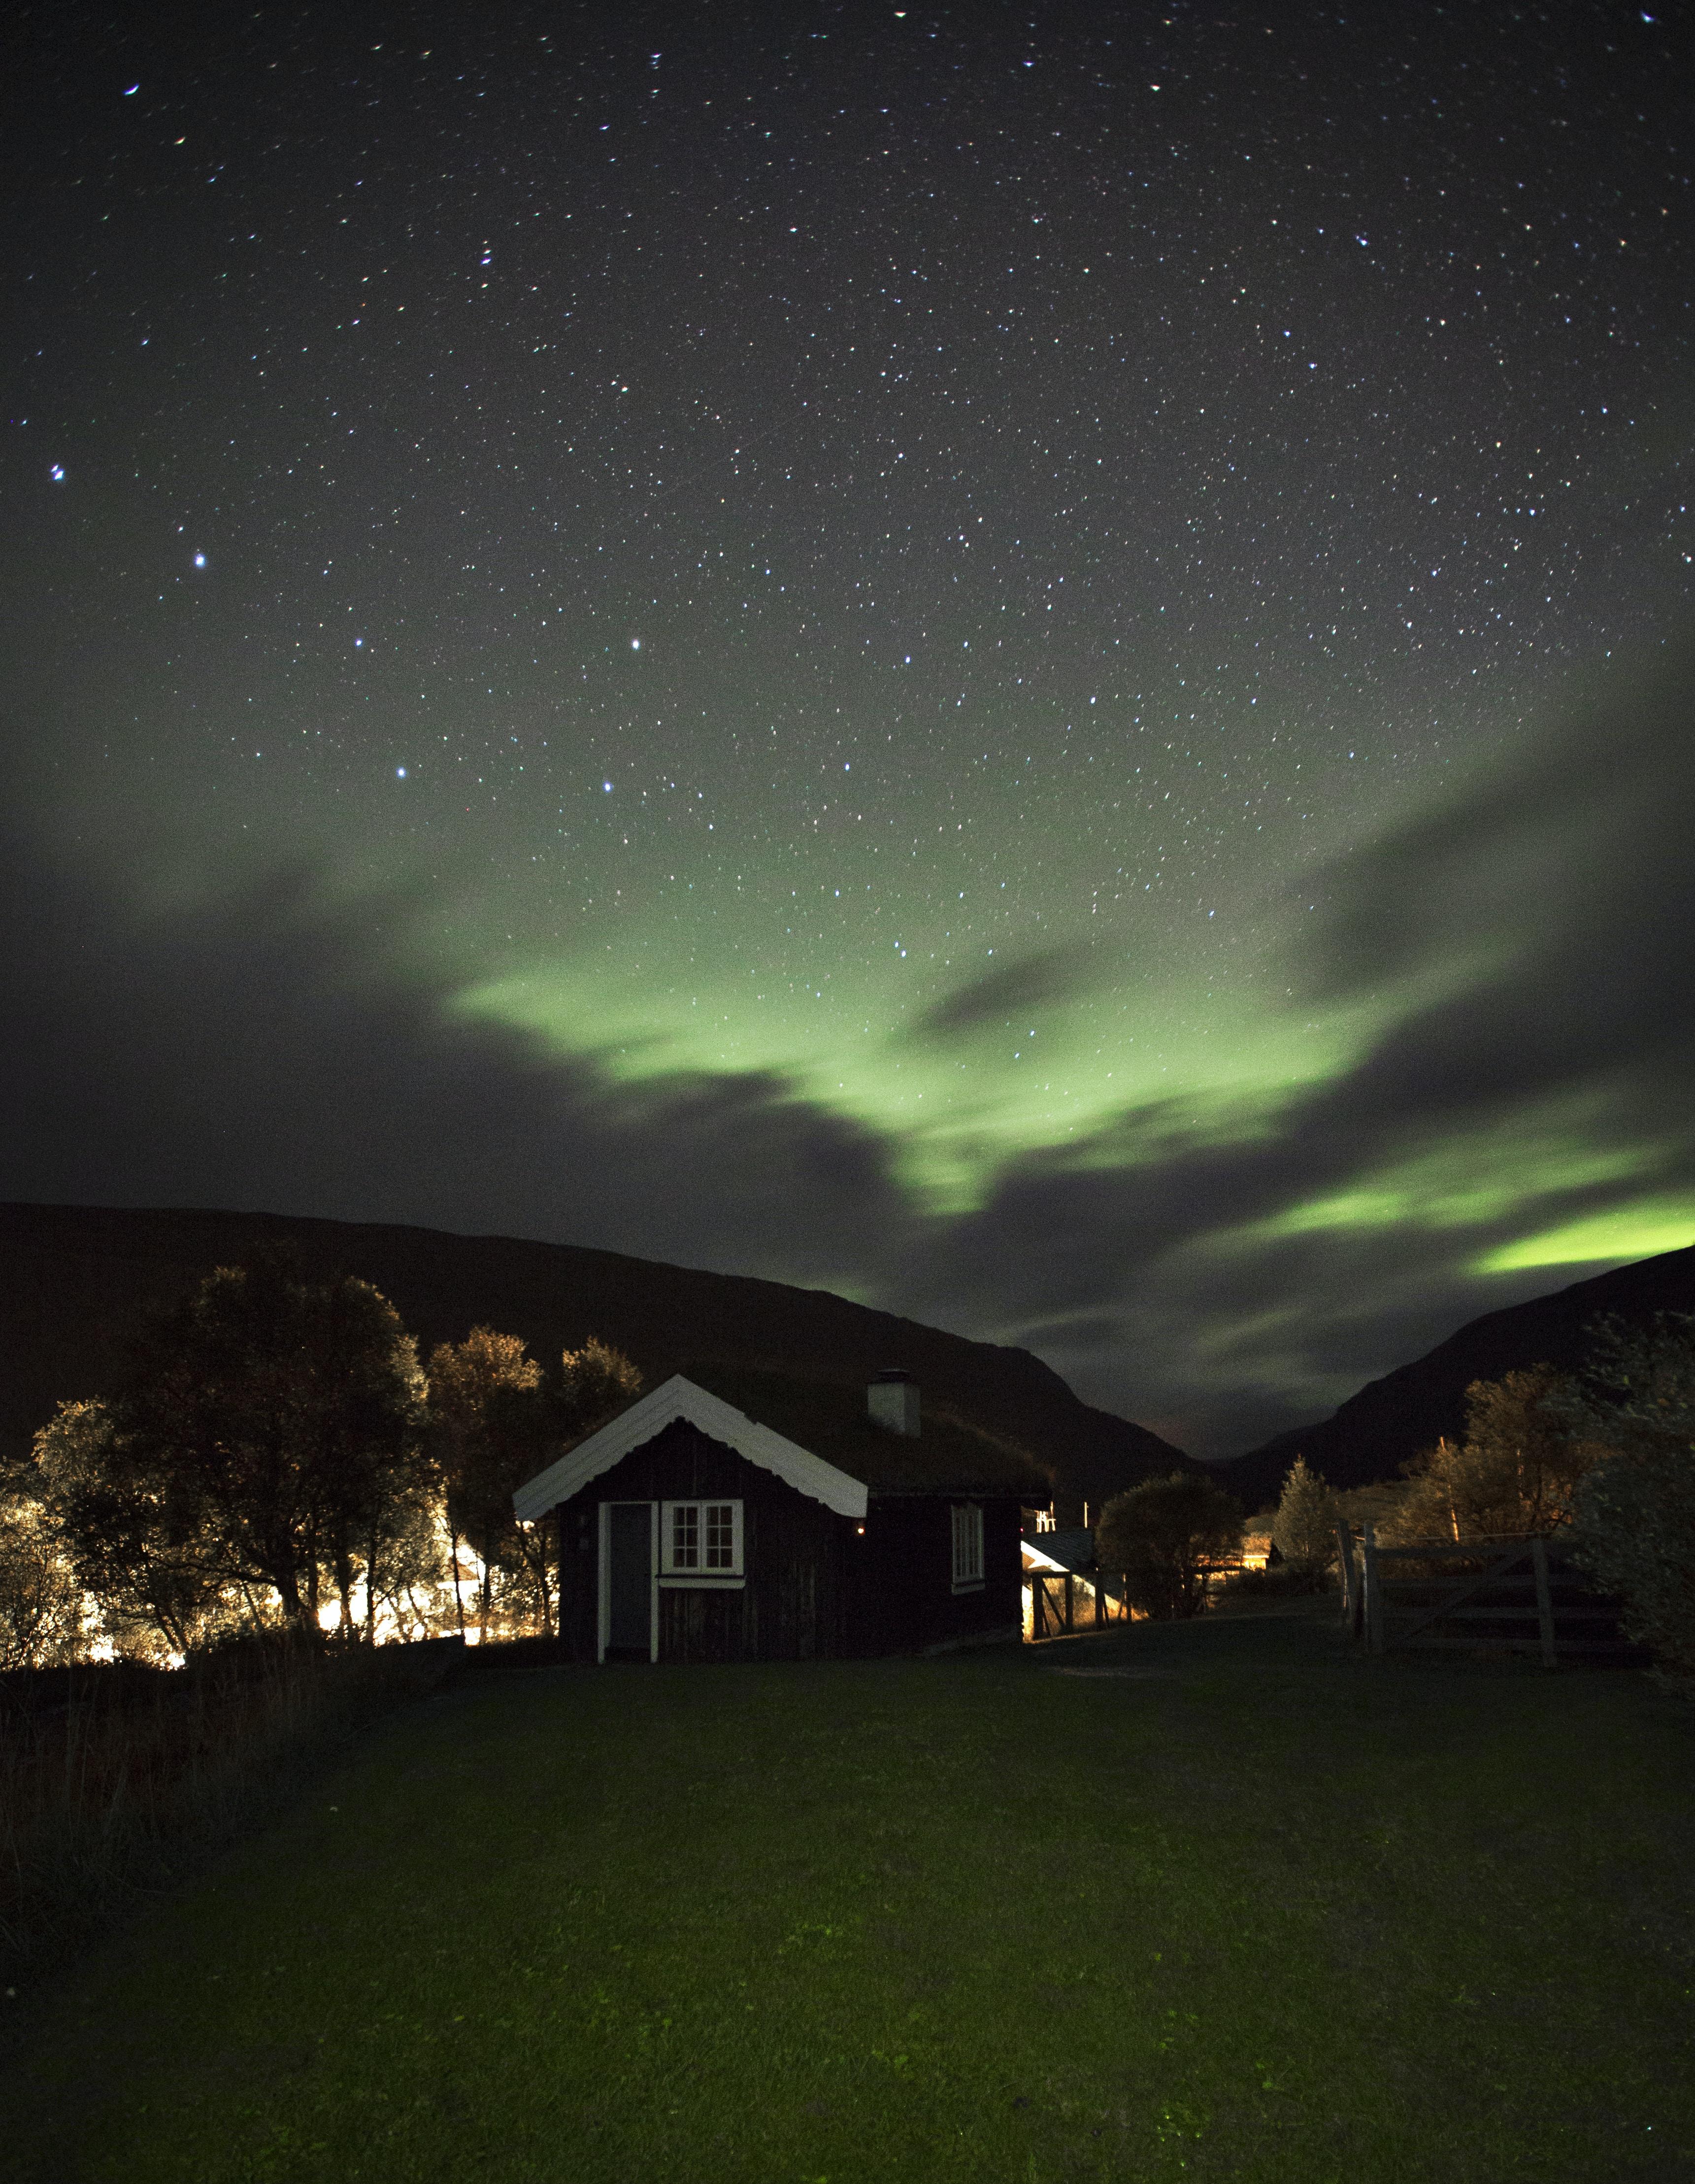 shed under green aurora sky